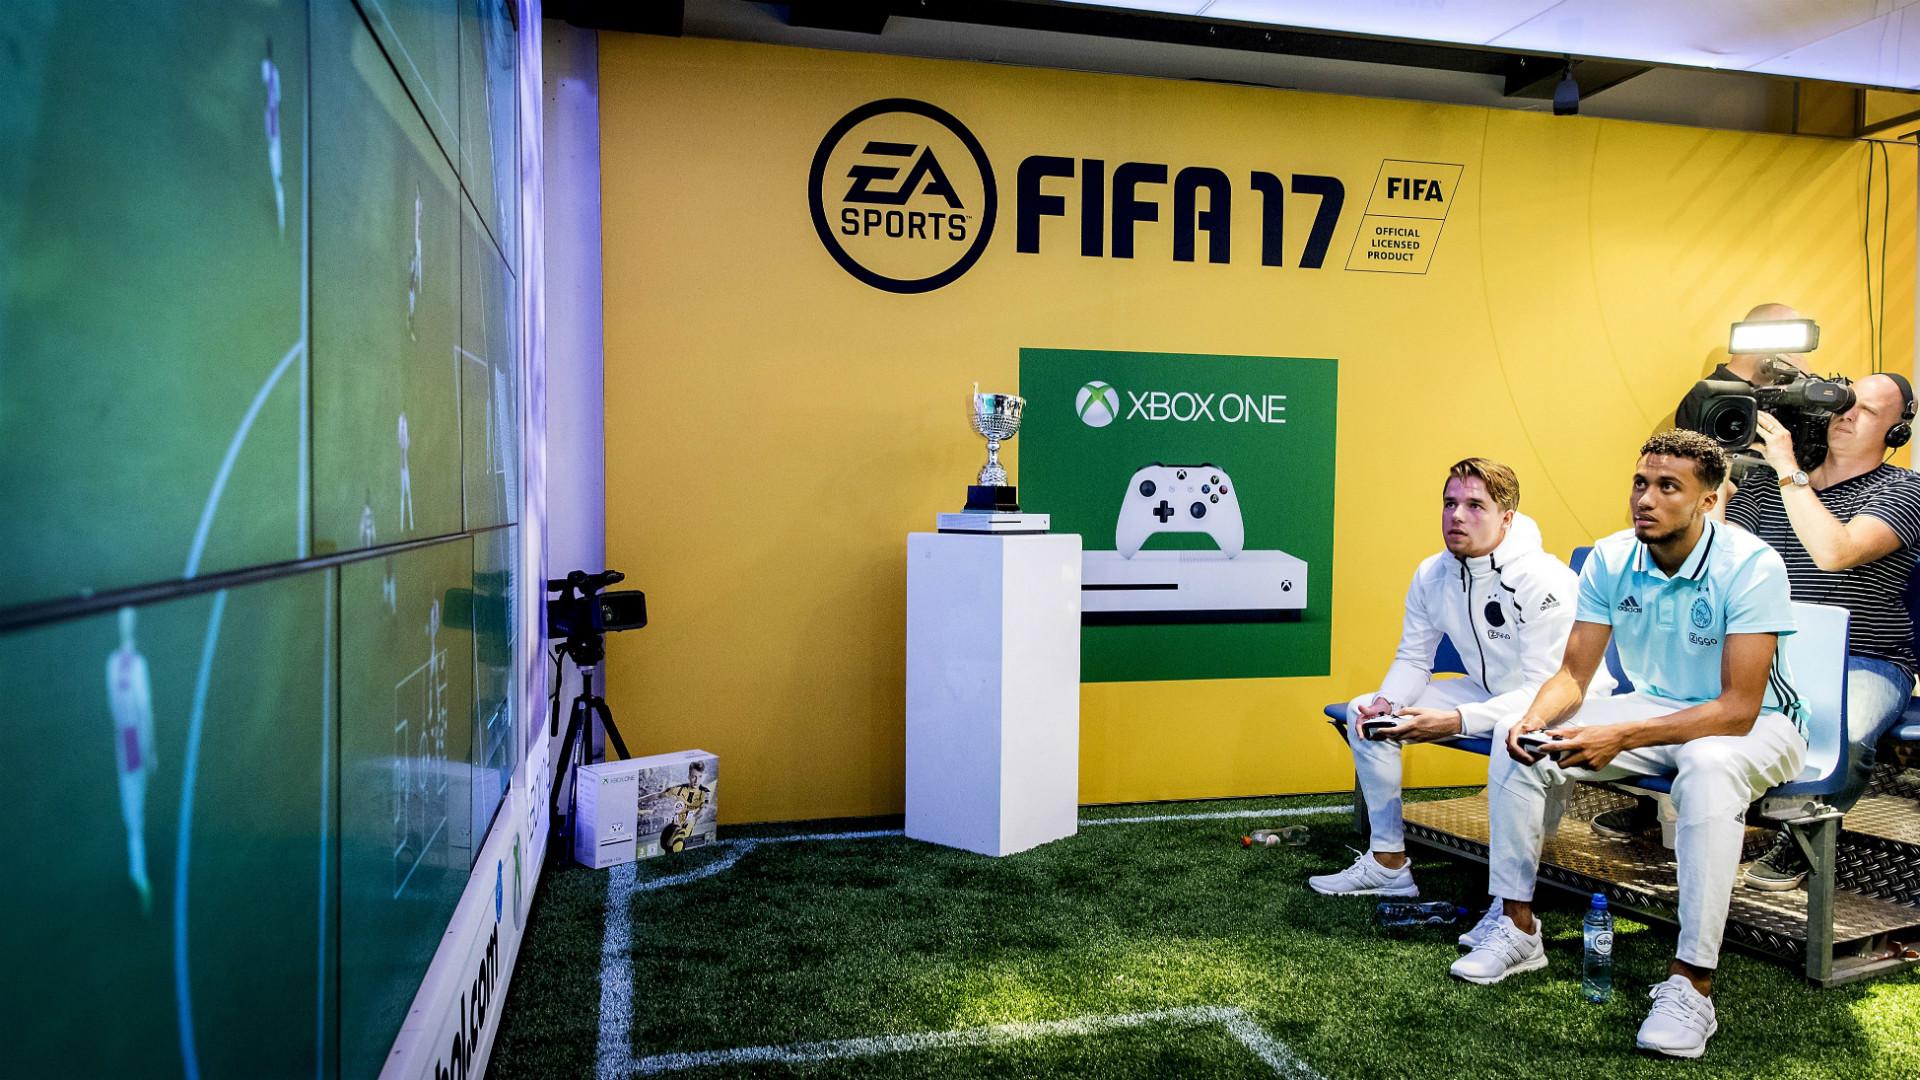 Ajax FIFA 17